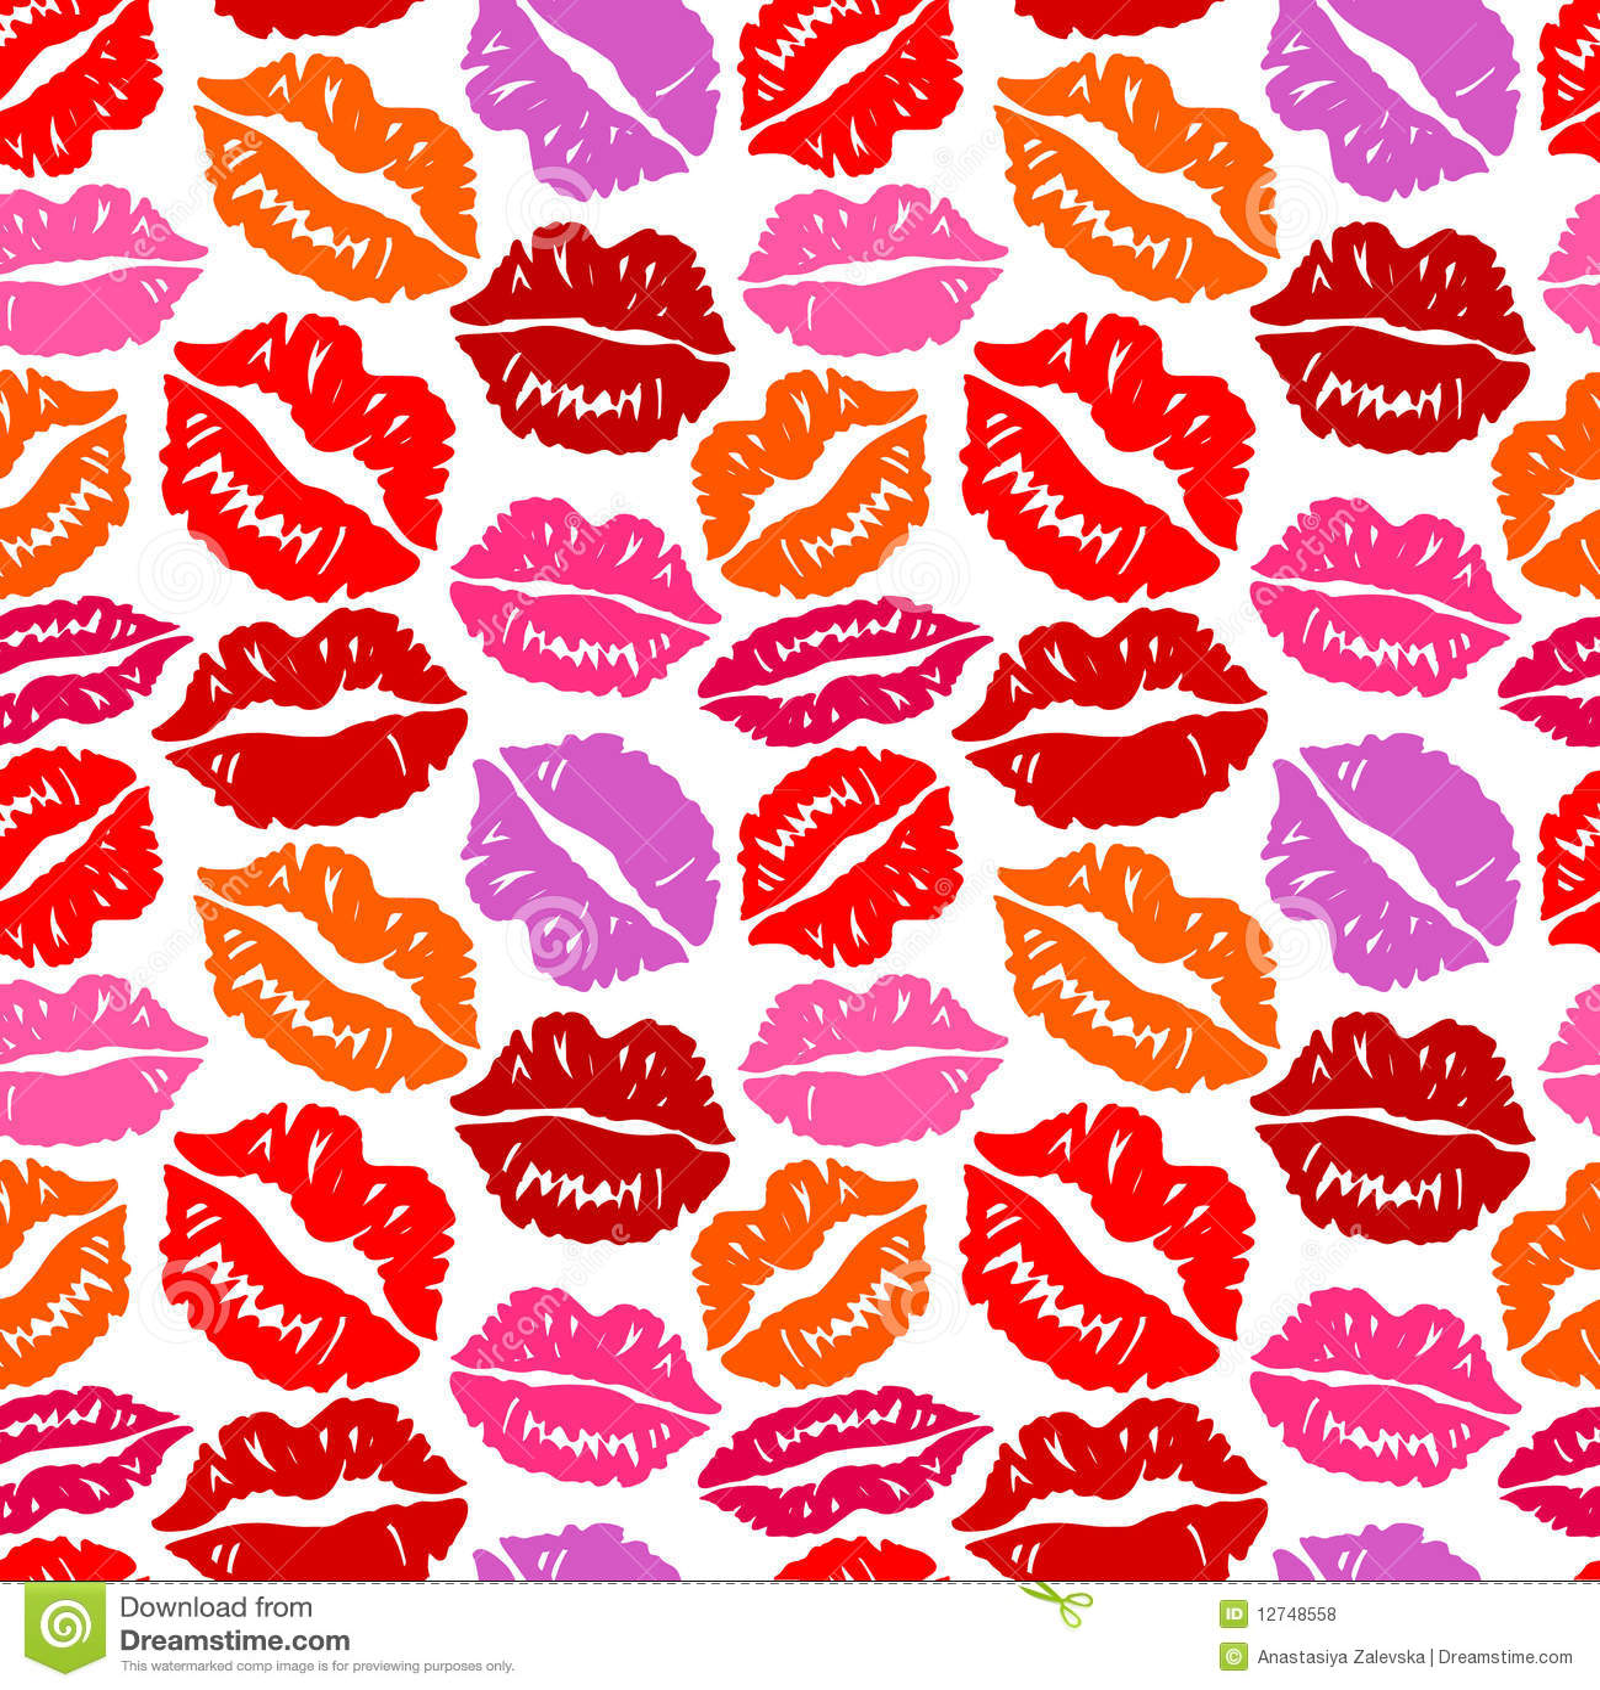 Lip Print WallpaperLip Print Wallpaper